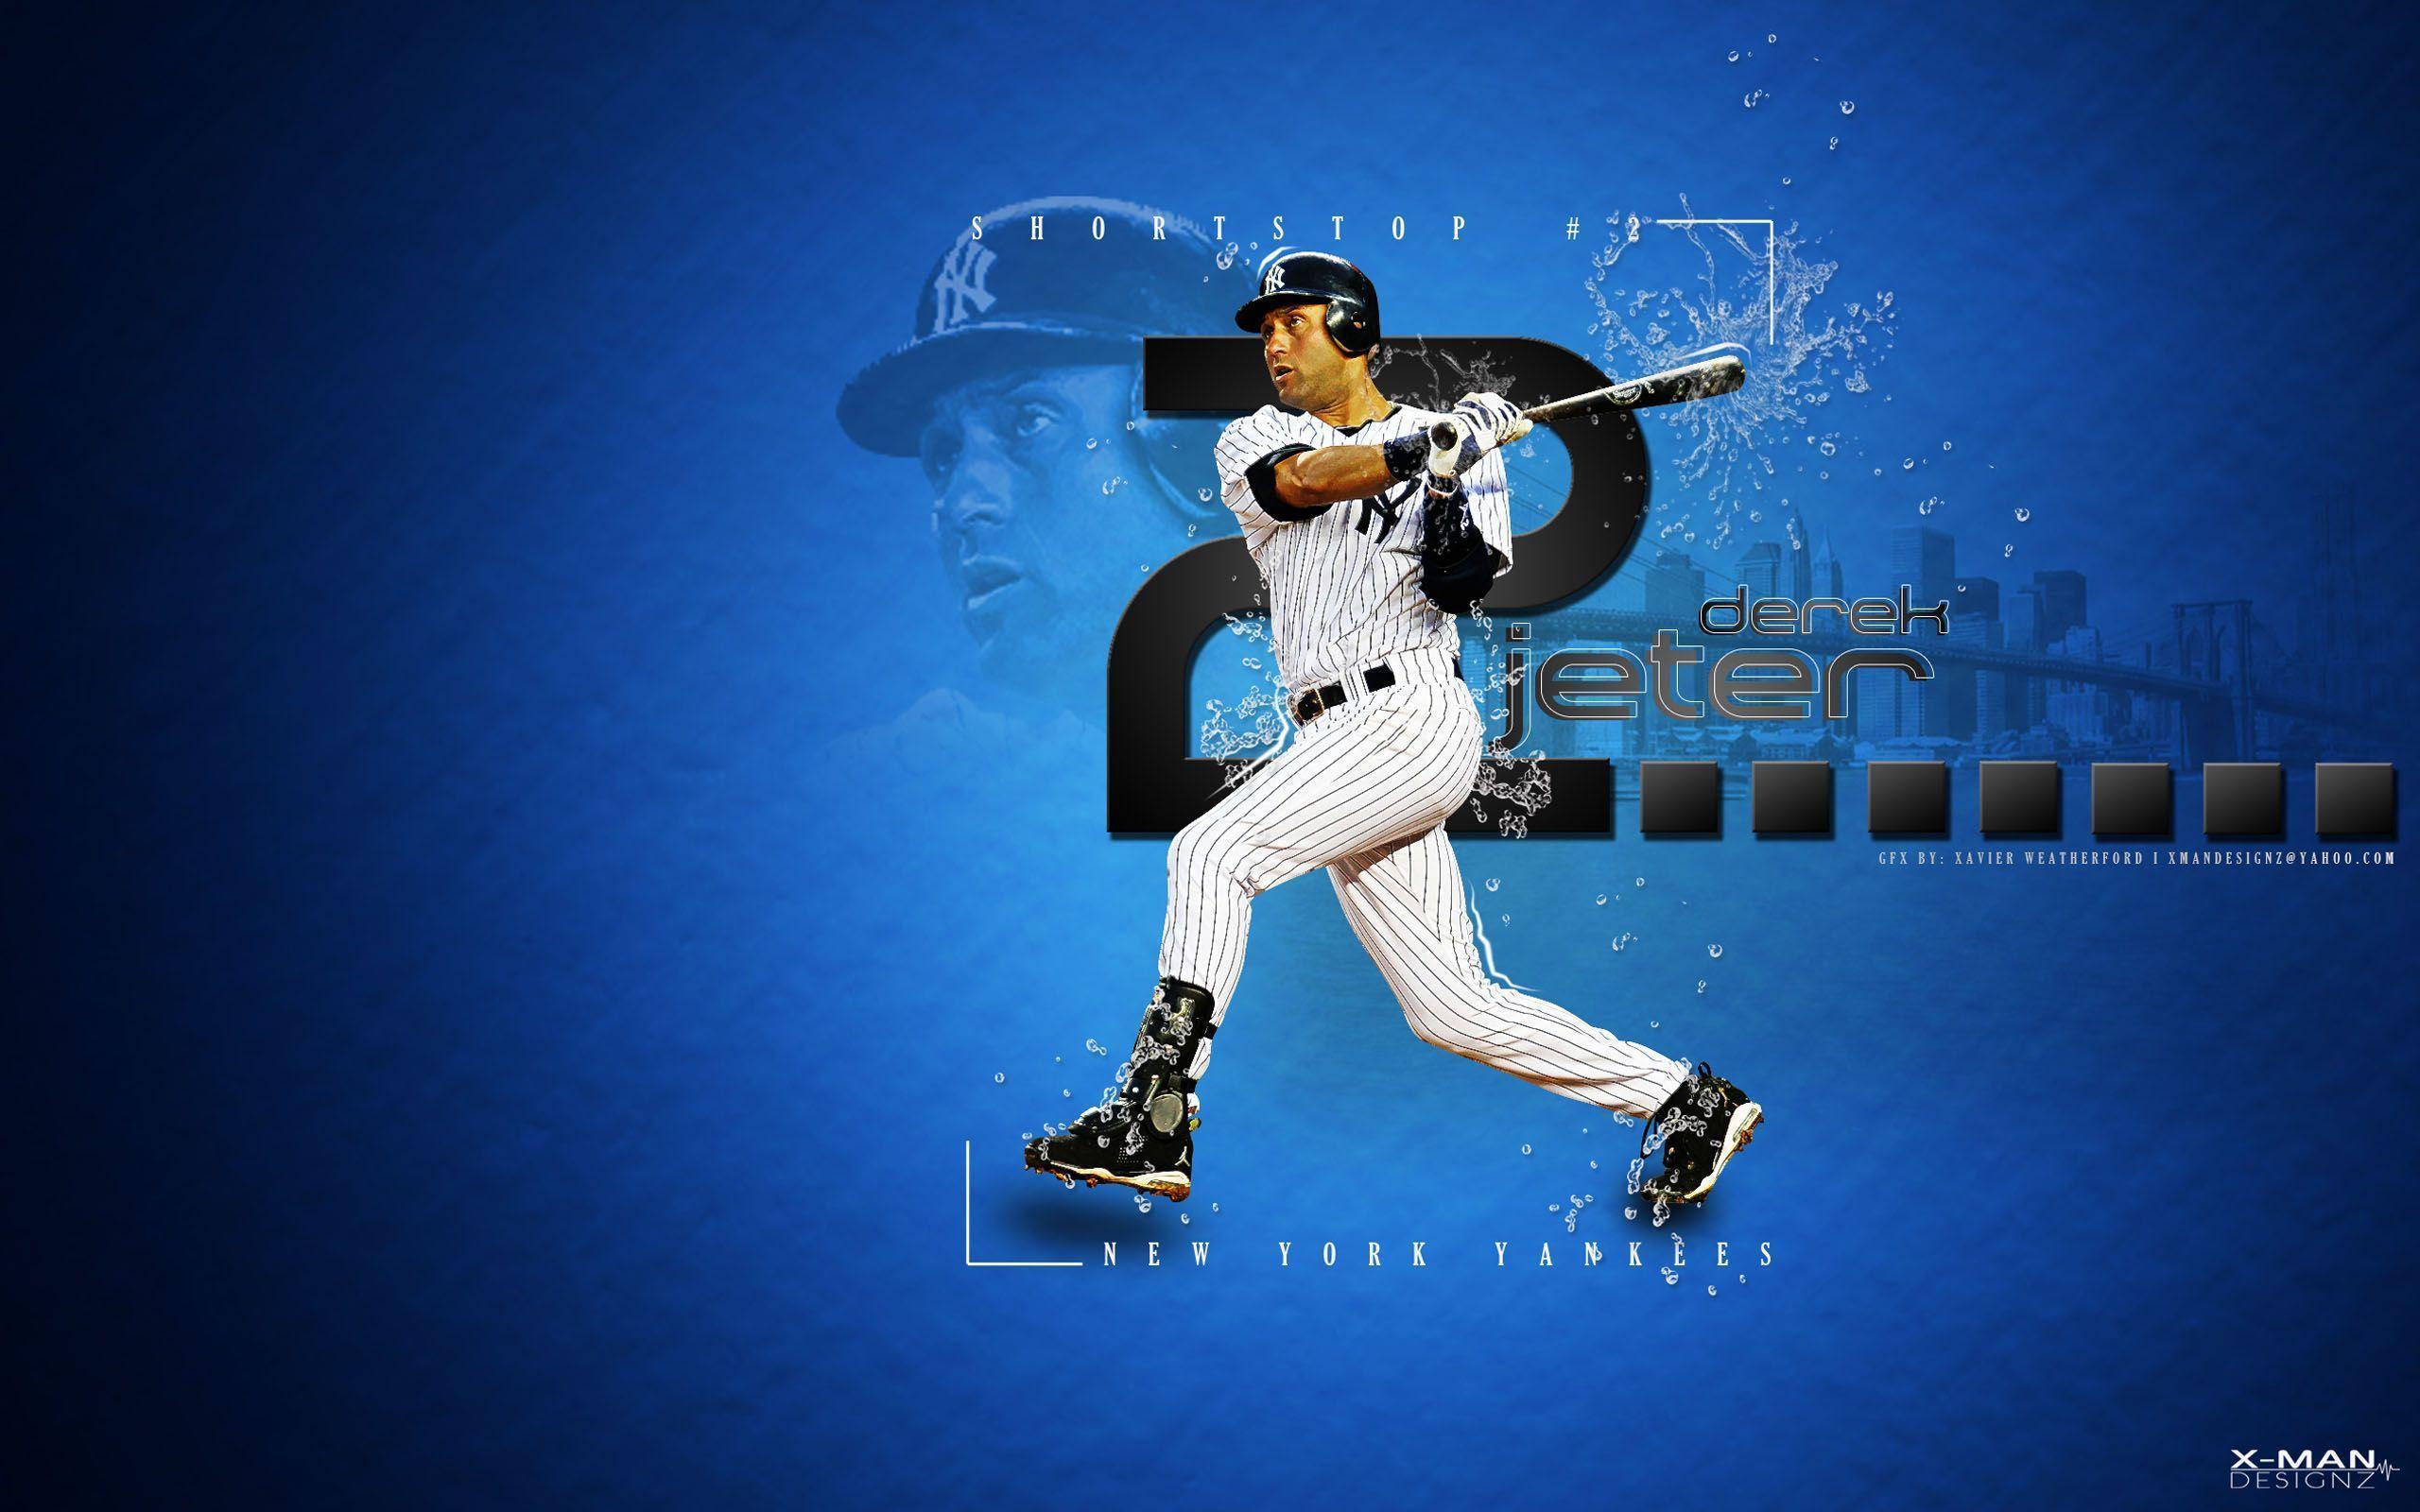 Seattle Mariners Wallpaper Iphone New York Yankees Logo Wallpapers Wallpaper Cave